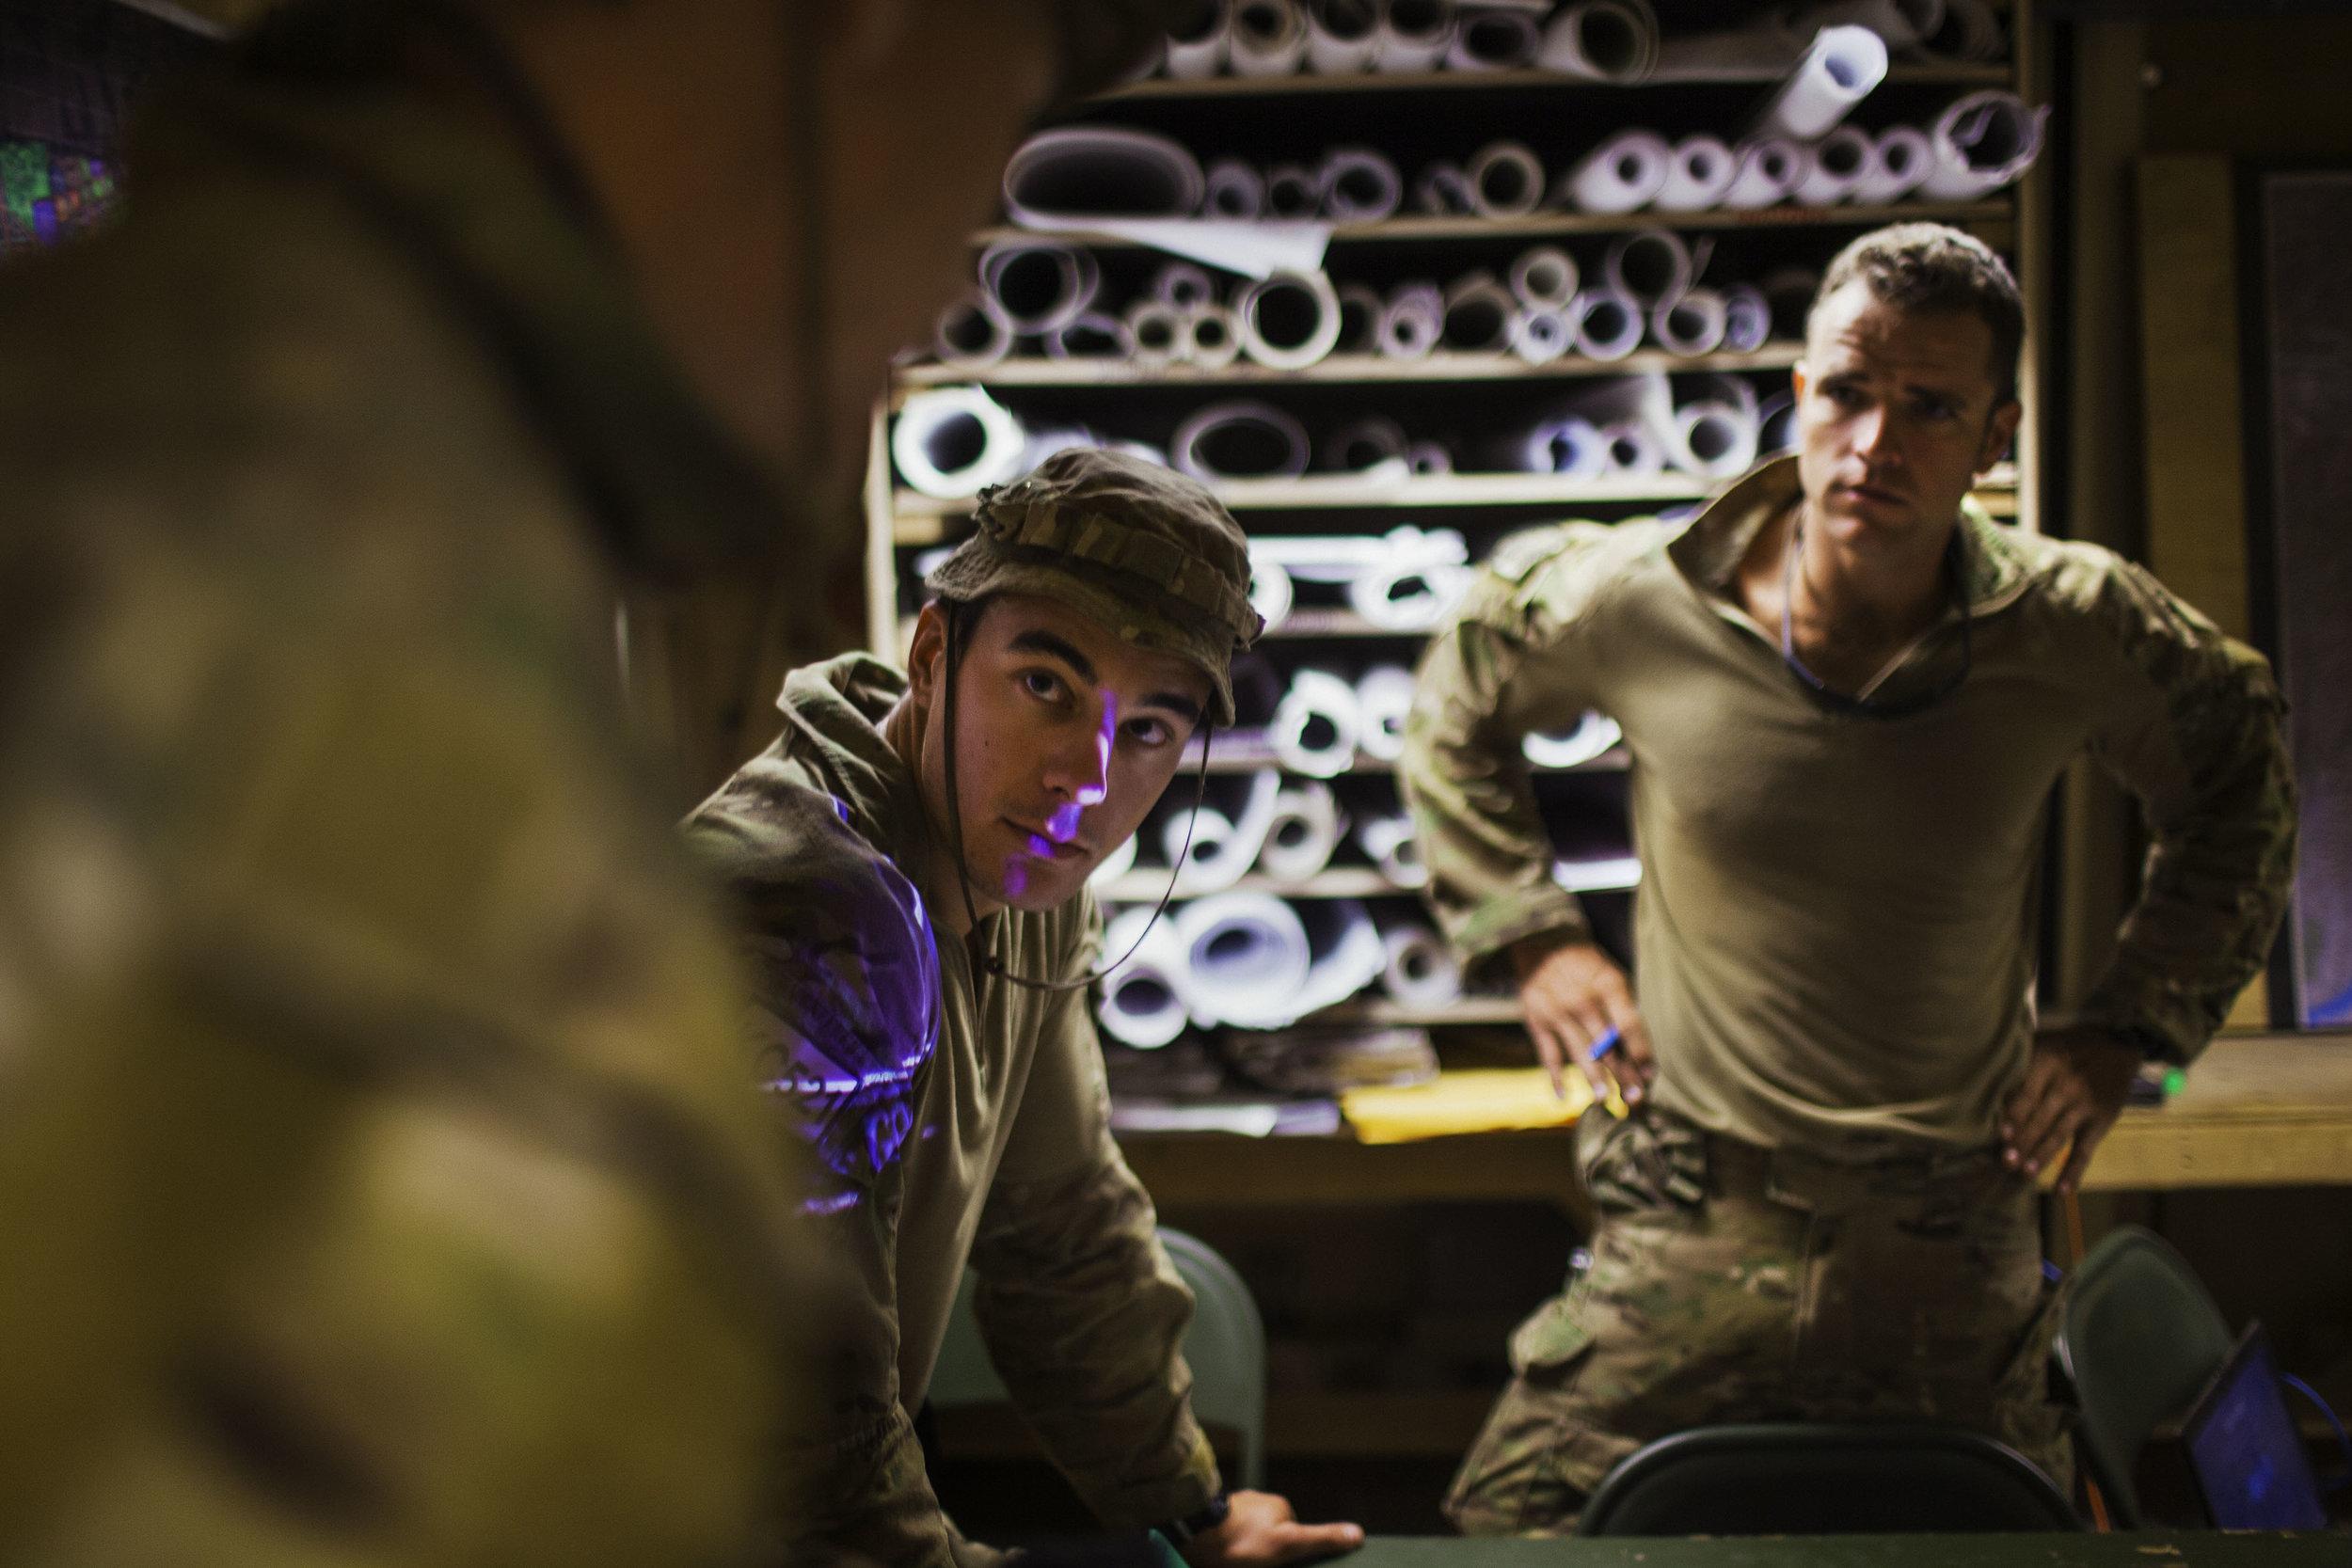 A work in progress project looking inside my own country.  Australian soldiers, Tarin Kowt, Afghanistan,2012